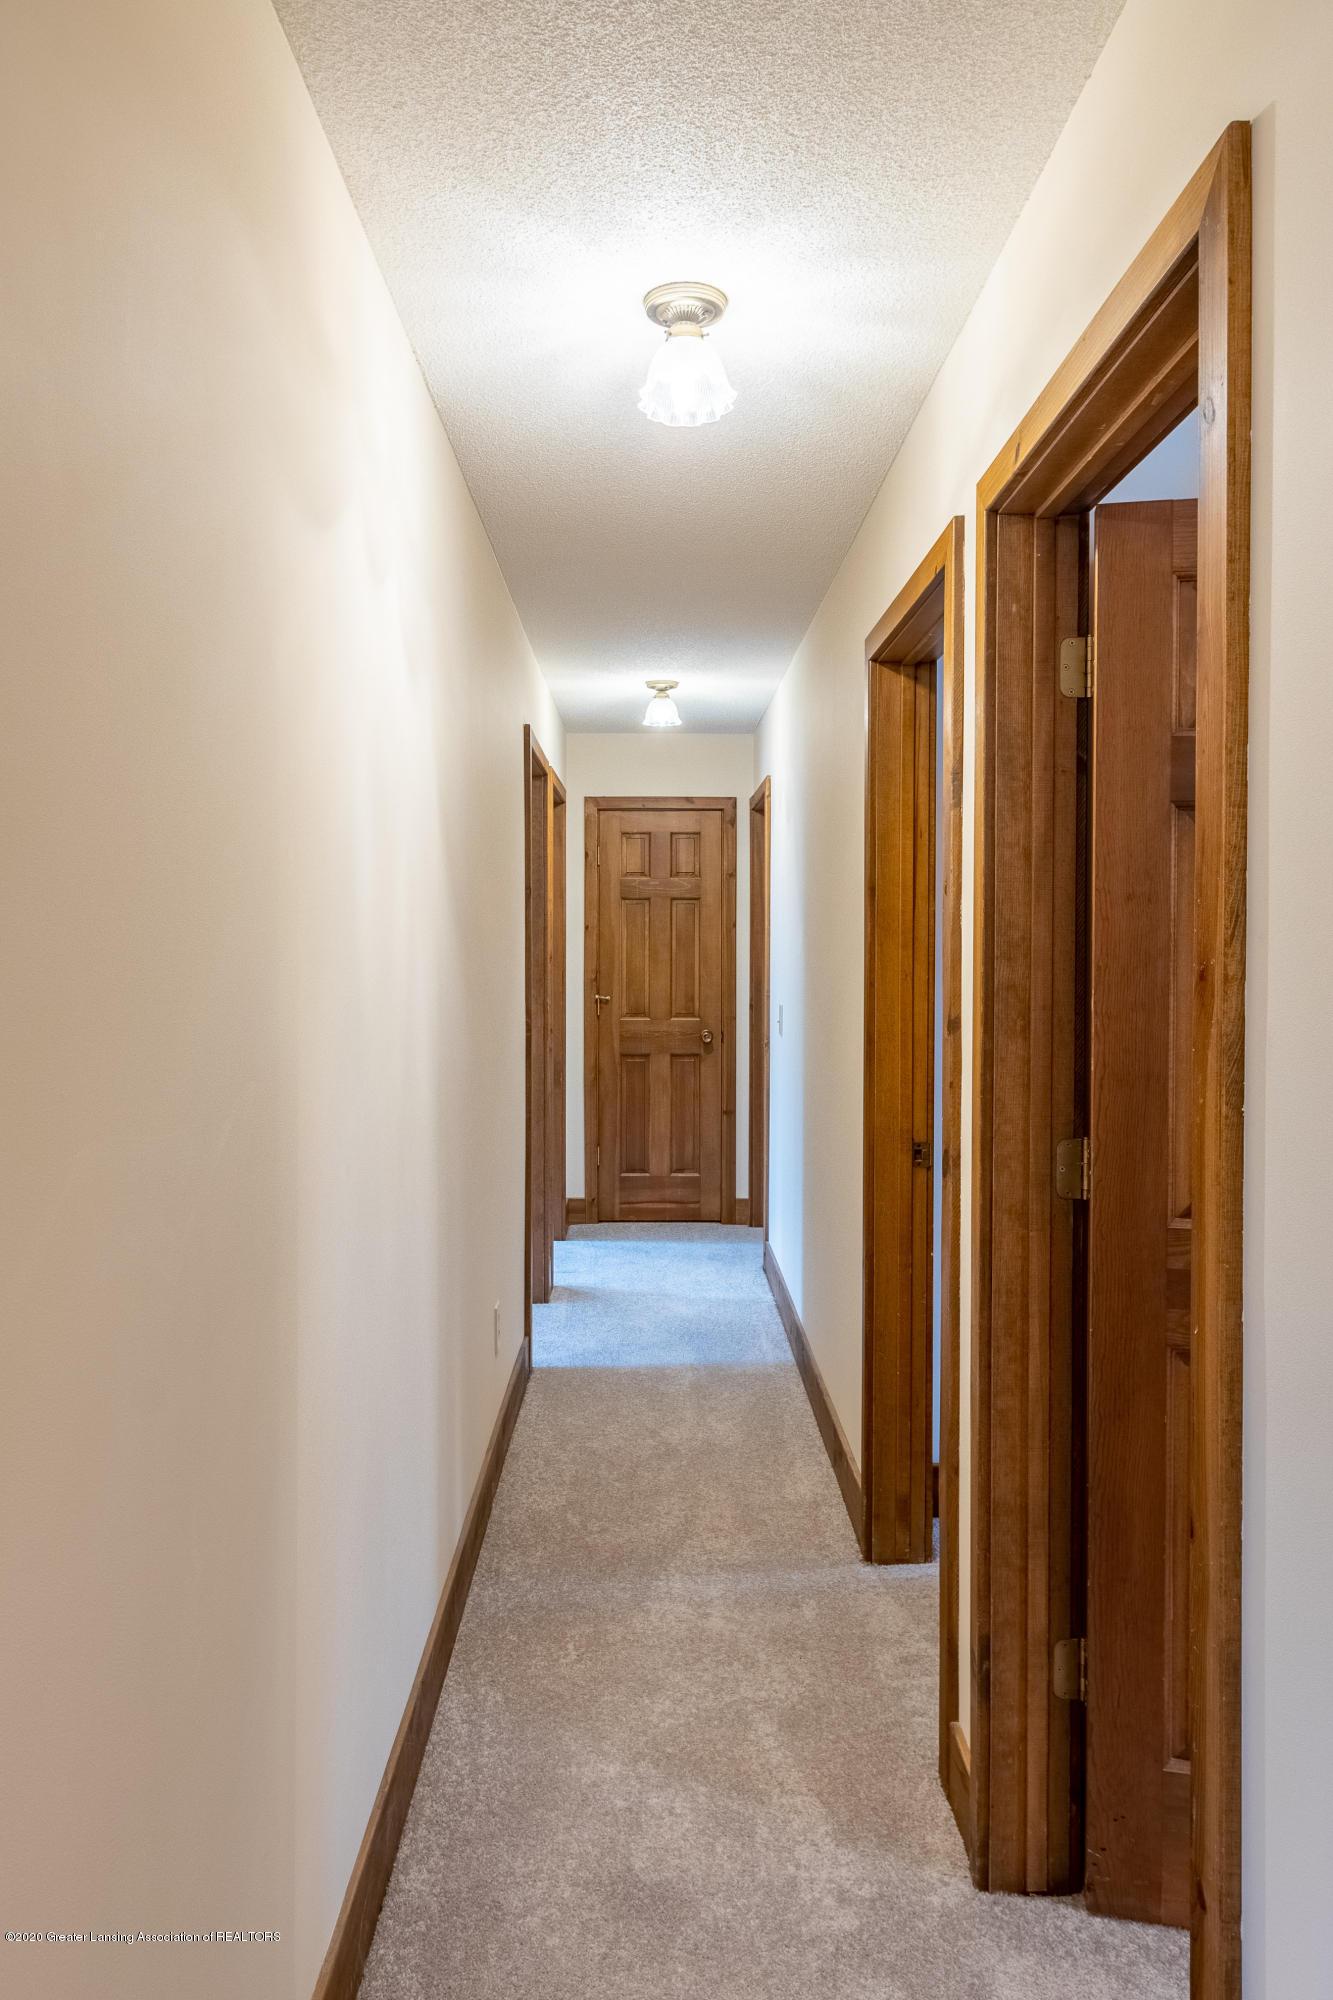 3945 Breckinridge Dr - Hallway Upper Level - 34